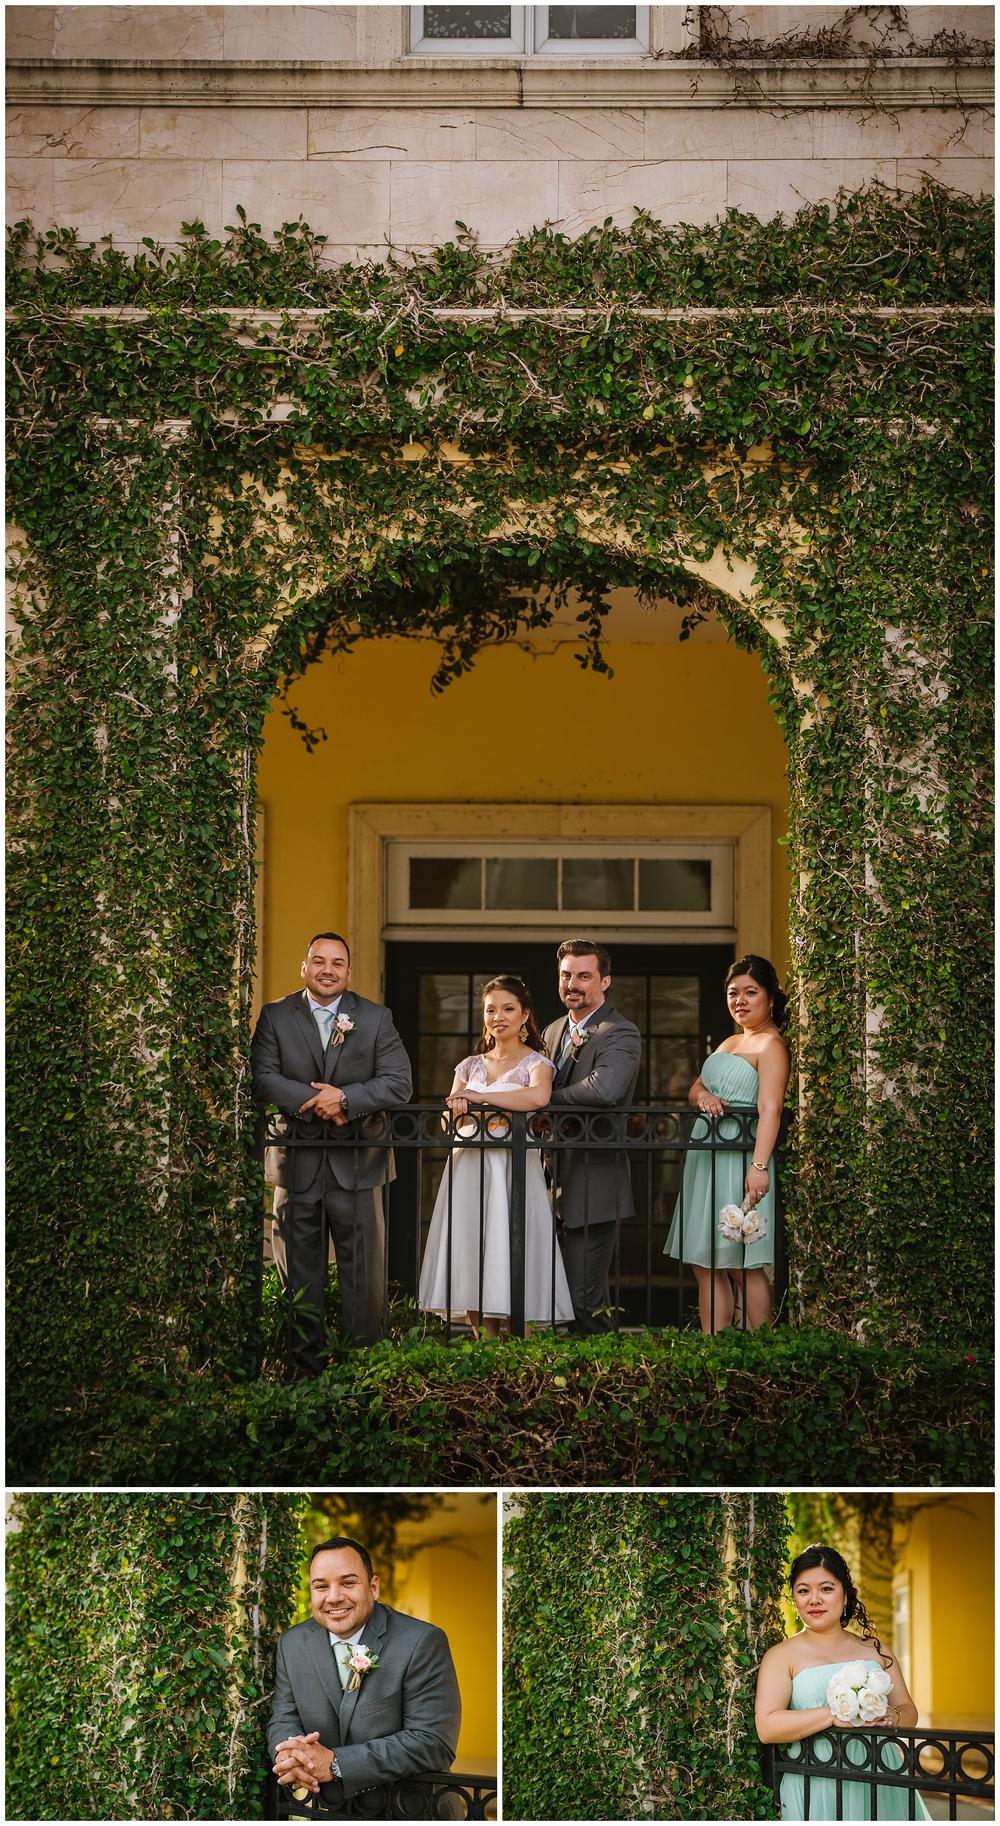 tampa-wedding-photographer-winthrop-barn-ivy-wall-portraits_0171.jpg